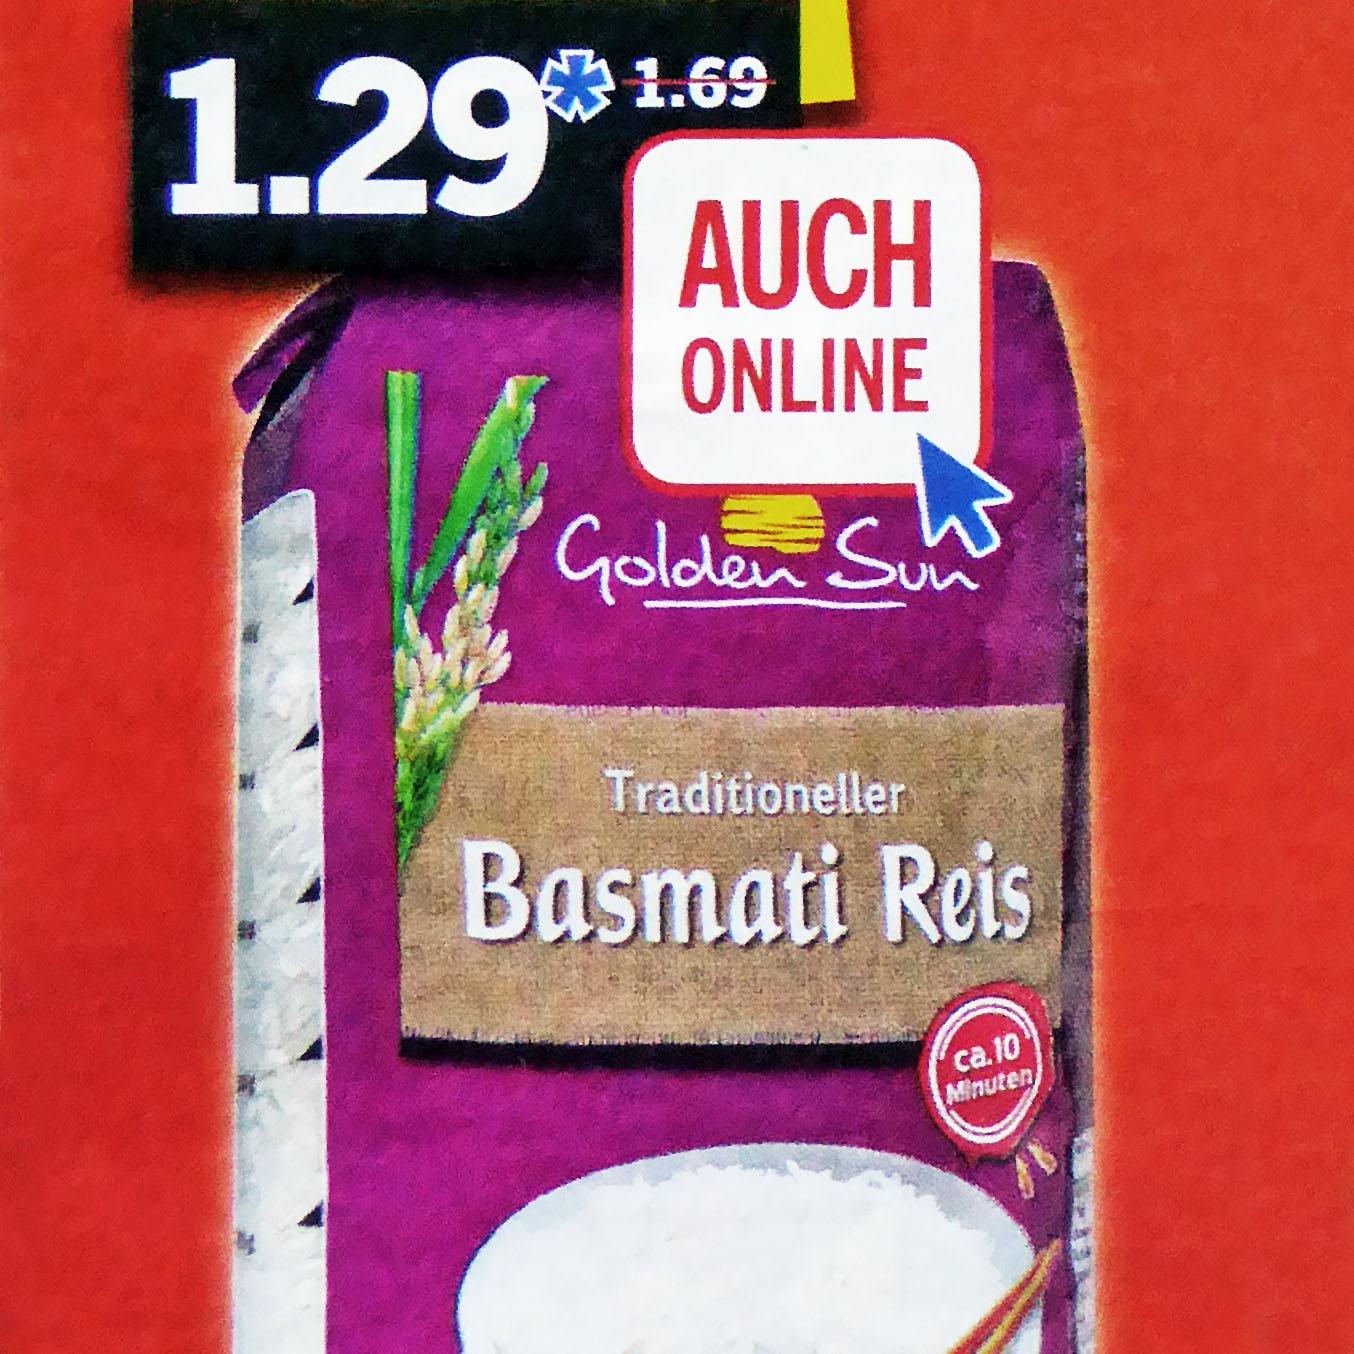 Basmati Reis 1 kg am Samstag, dem 17.9. für nur 1,29€  bei [Lidl]